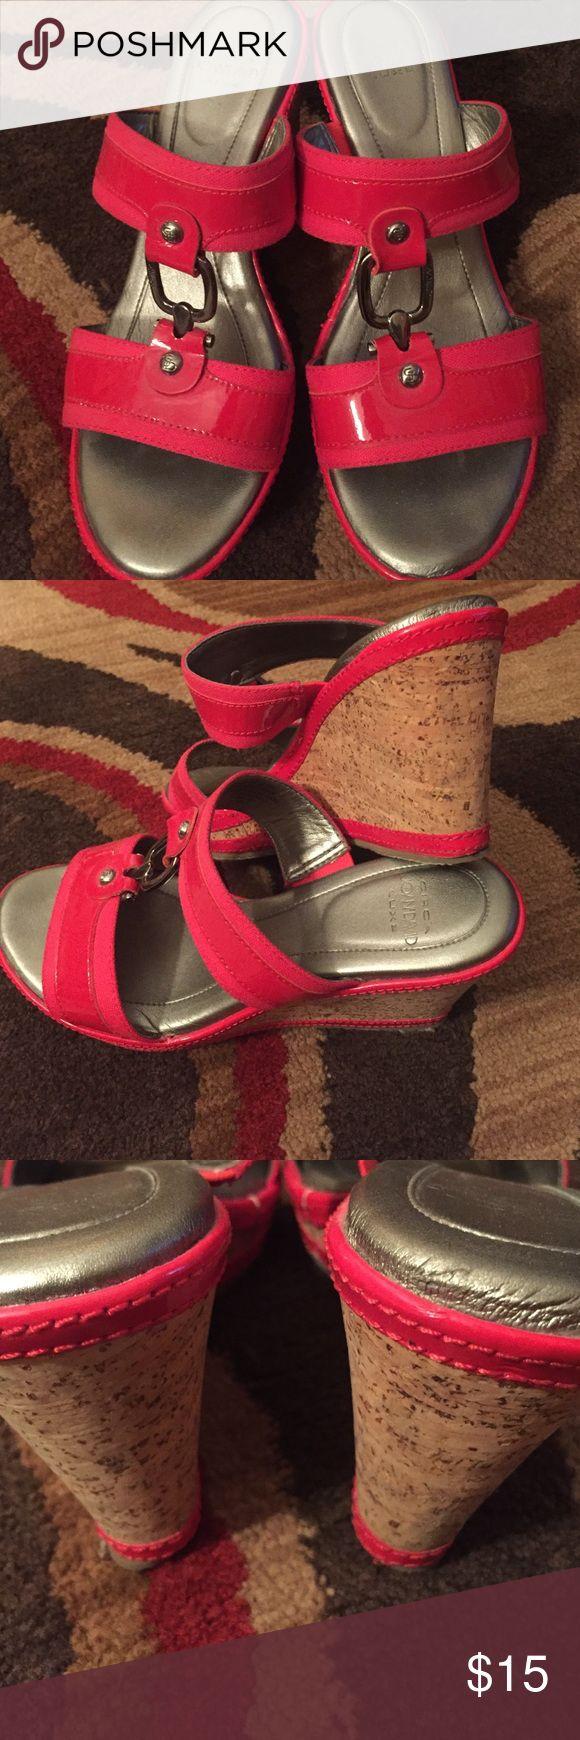 Circa Joan David Luxe Sandals, sz 6 Sexy preowned  sandals, sz 6 Joan & David Shoes Sandals